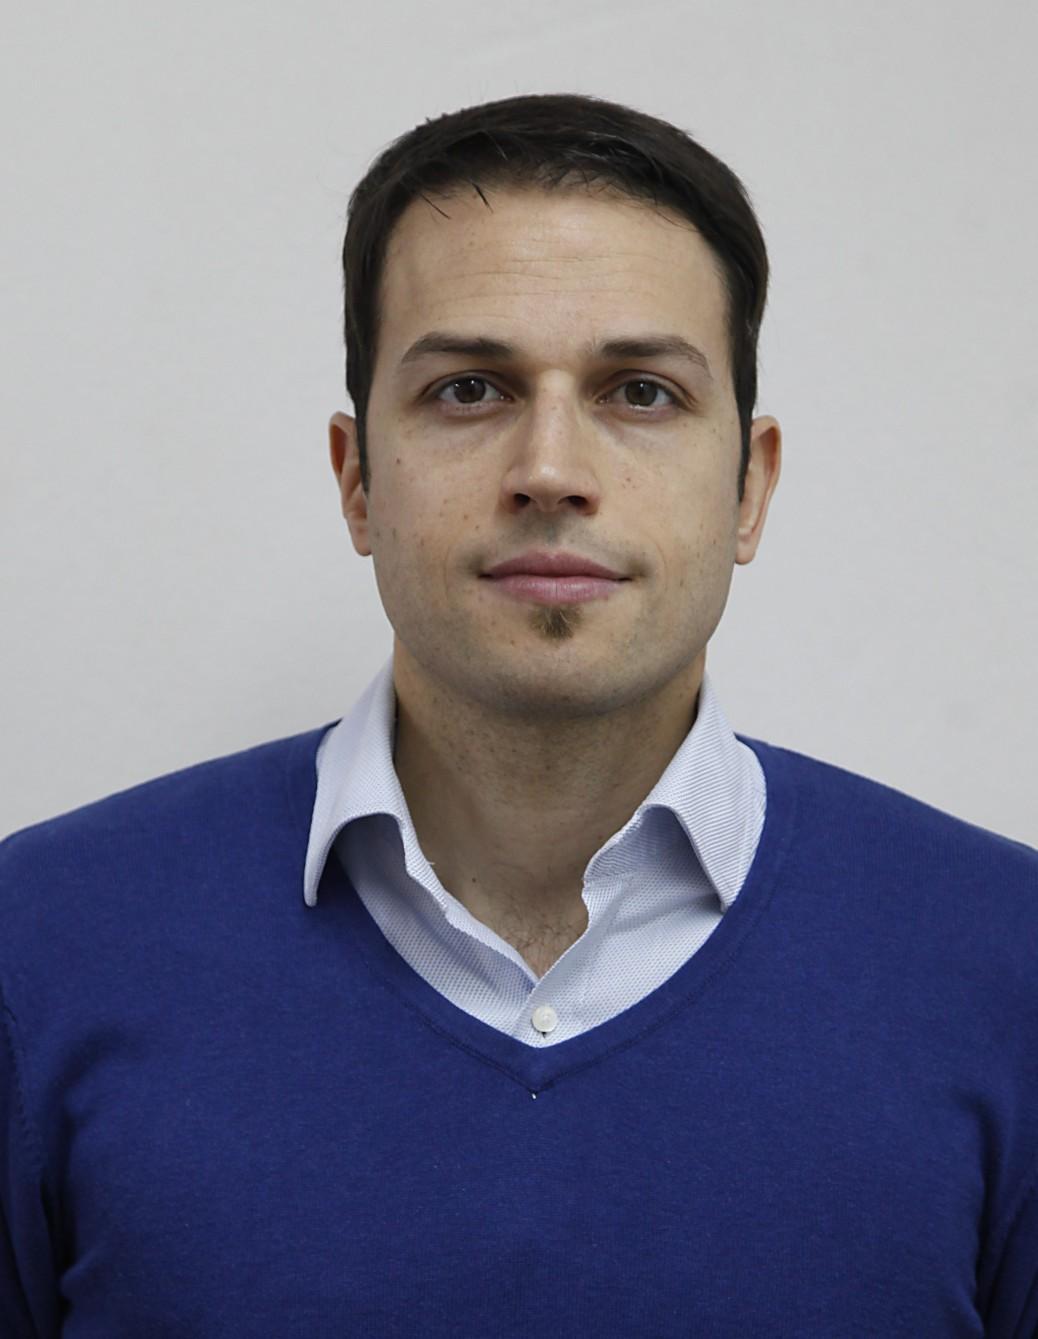 Muñiz-Fernando-26855624-director-gral-de-fiscalizacion-1038x1339